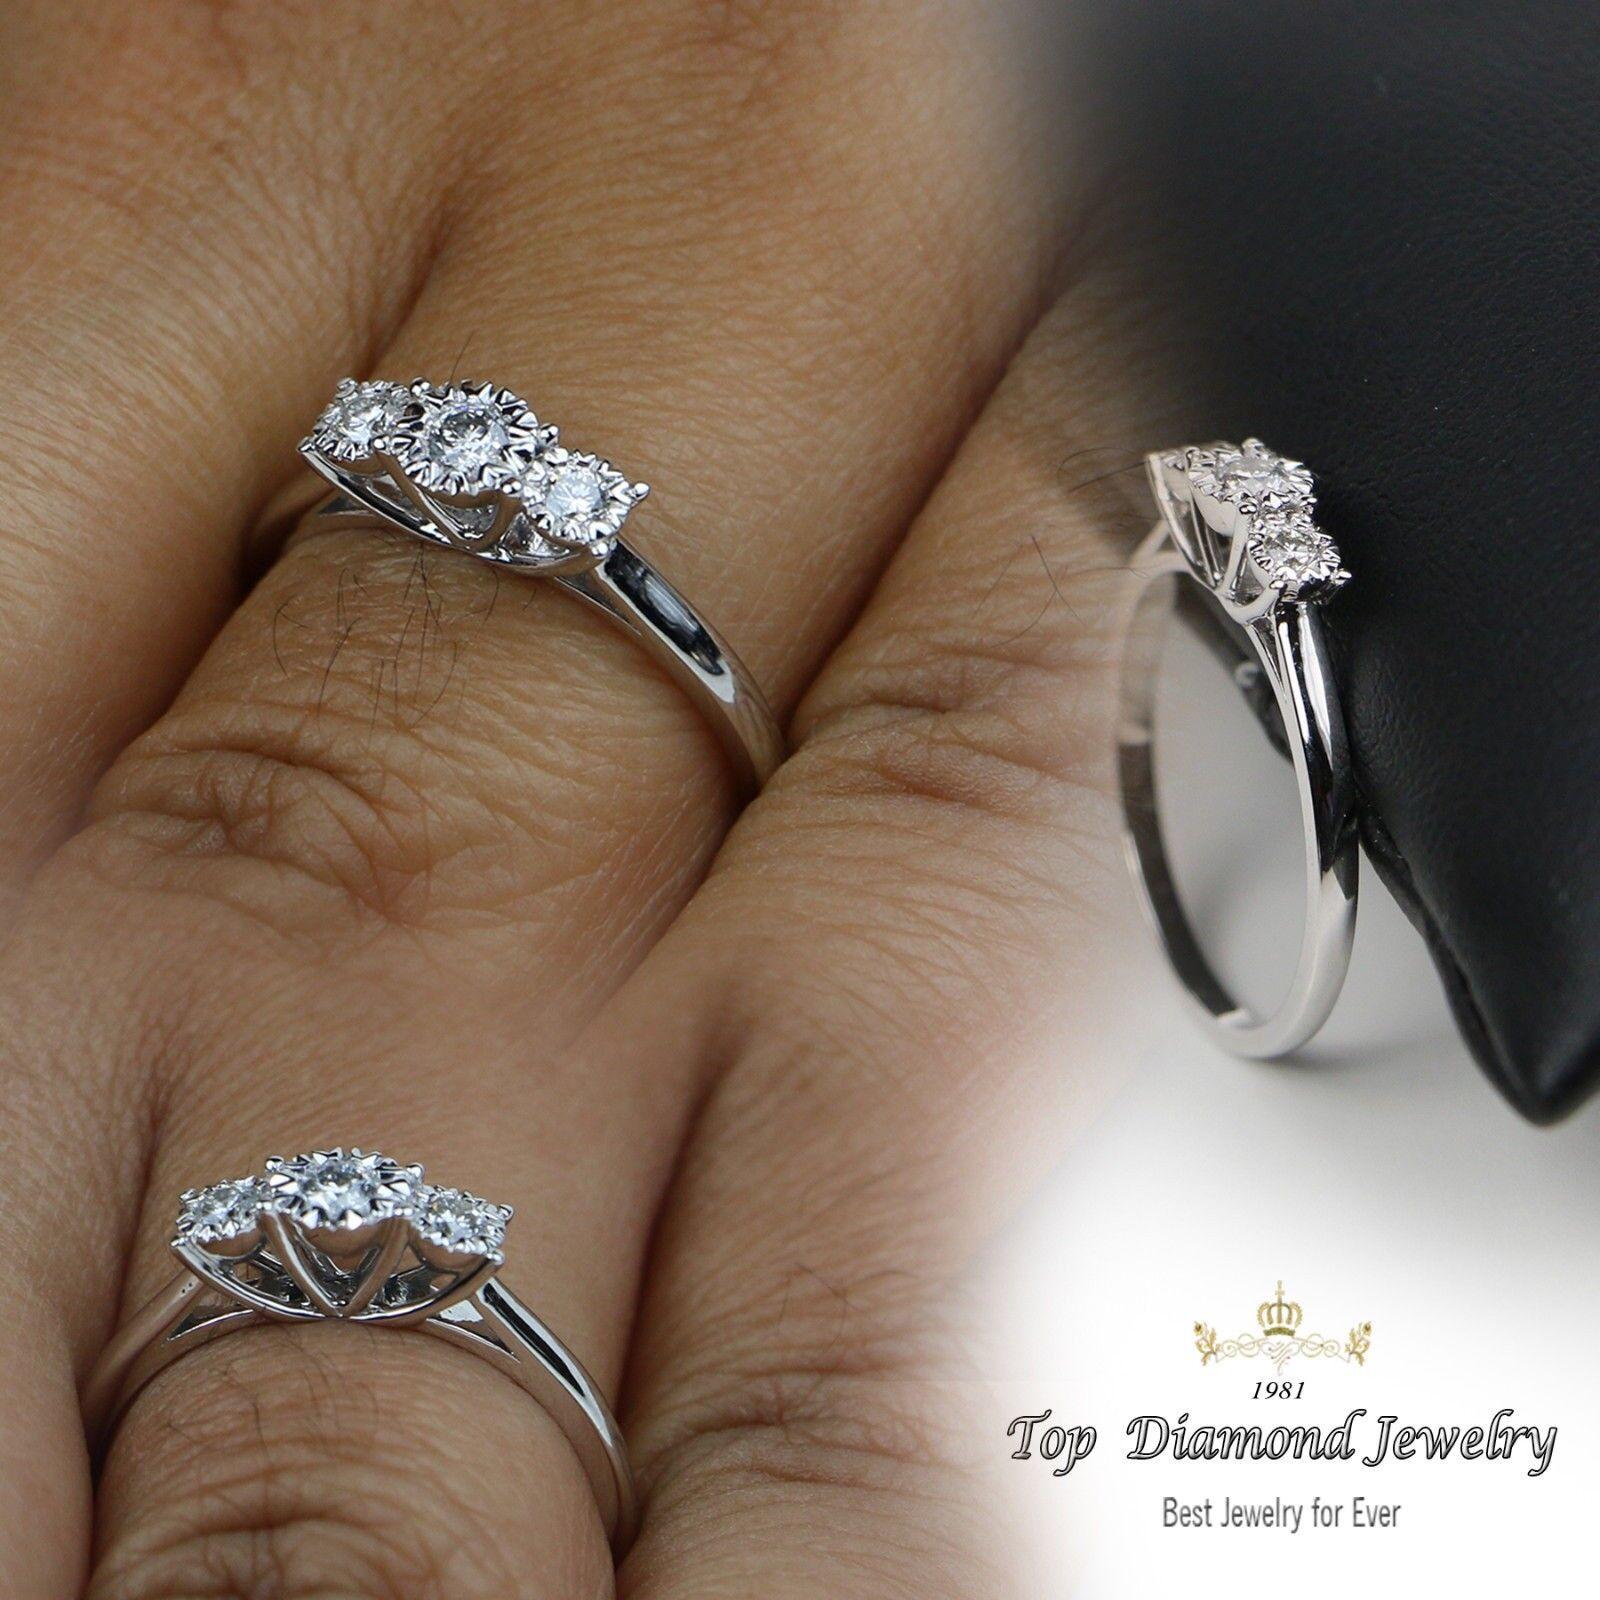 0.22 Ct Round Cut Diamond Engagement Ring 14K White gold